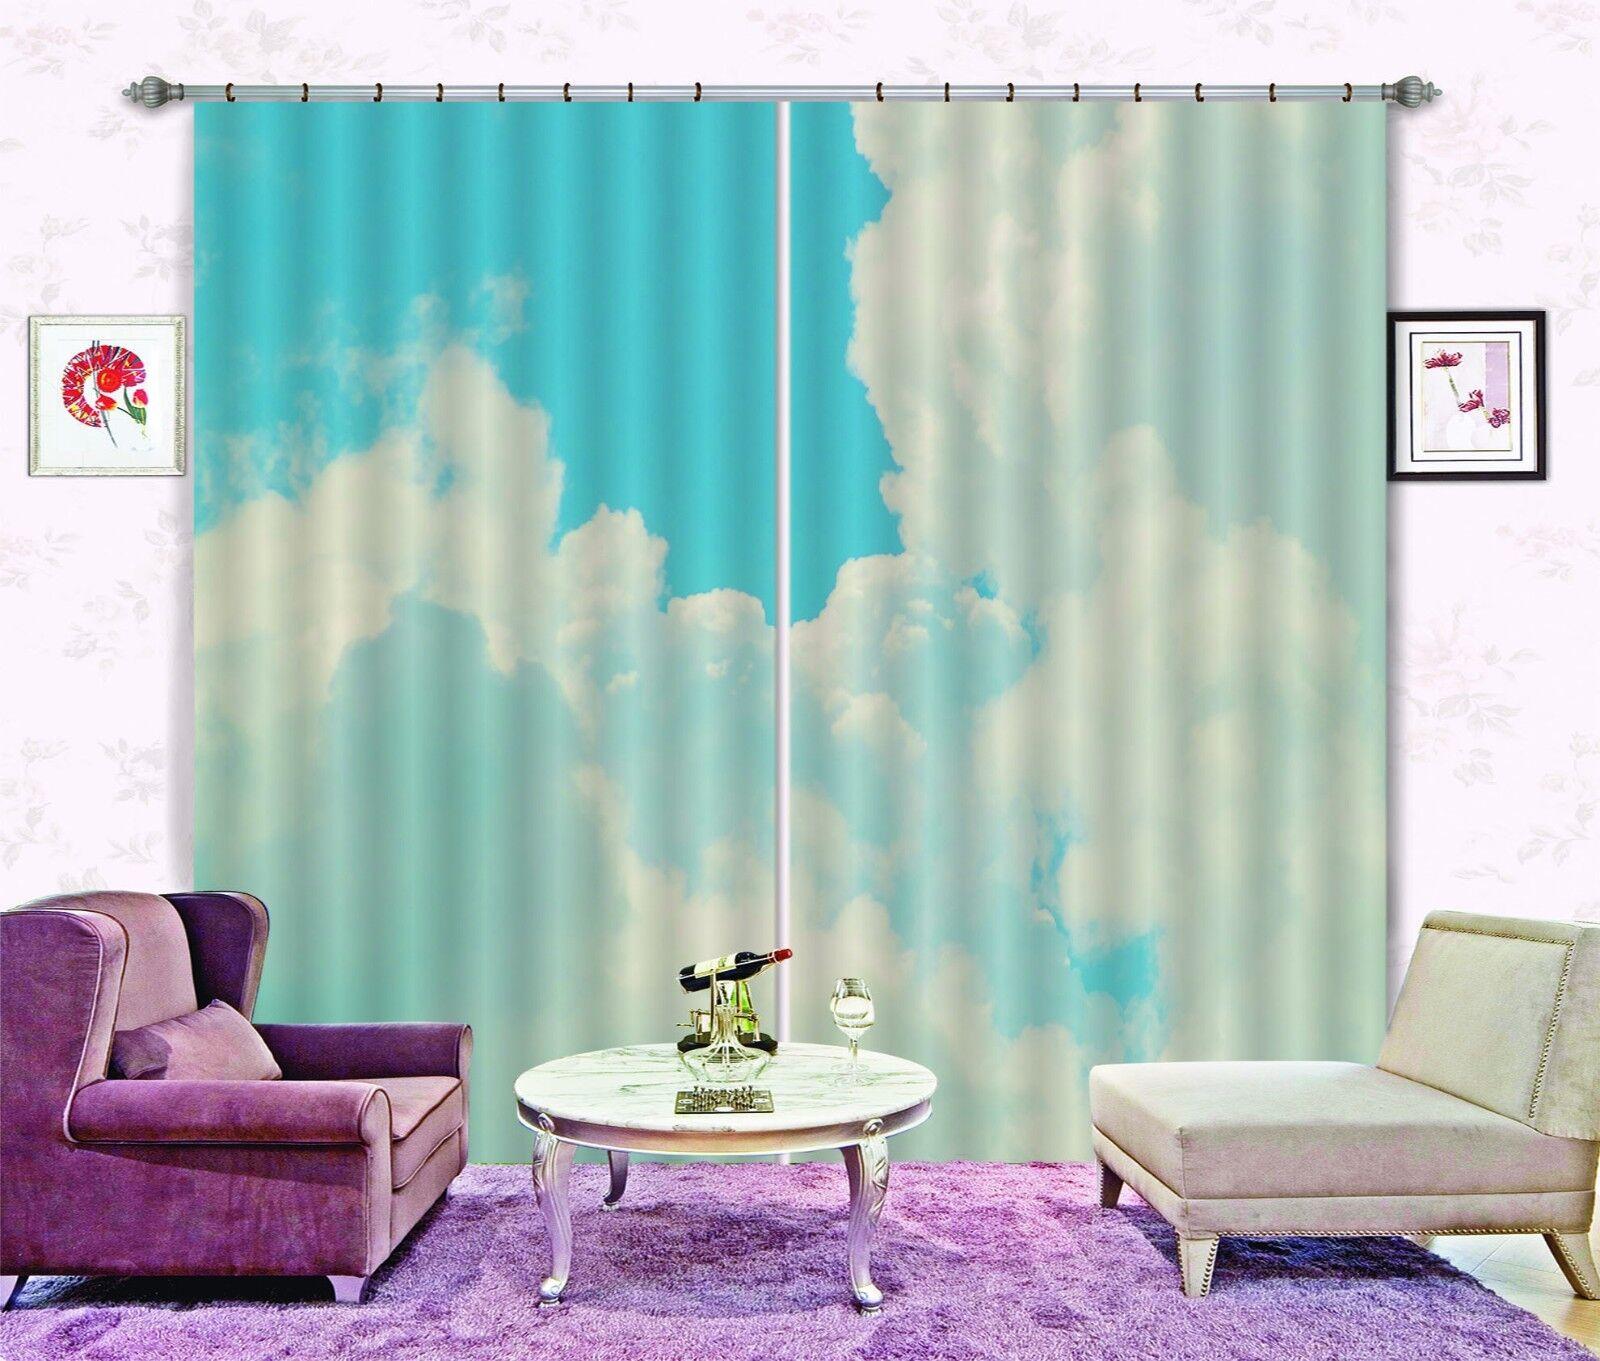 3D buen nube 22 Cortinas de impresión de cortina de foto Blockout Tela Cortinas Ventana CA